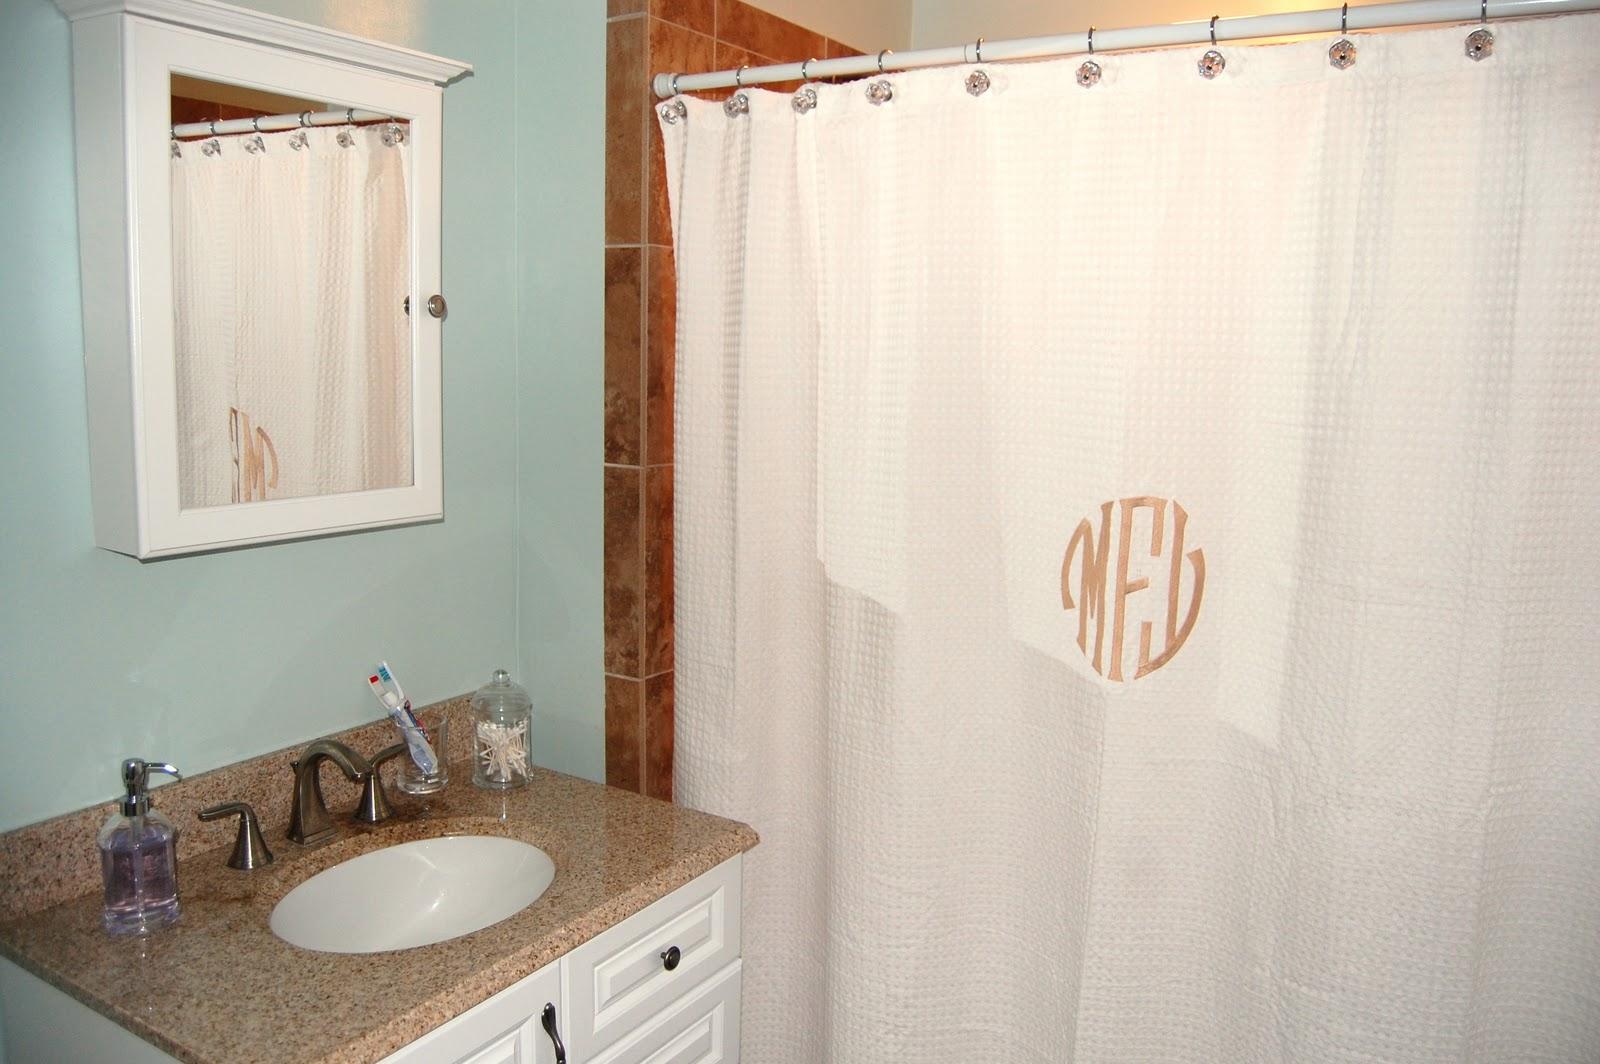 Pottery barn monogrammed shower curtain myideasbedroom com